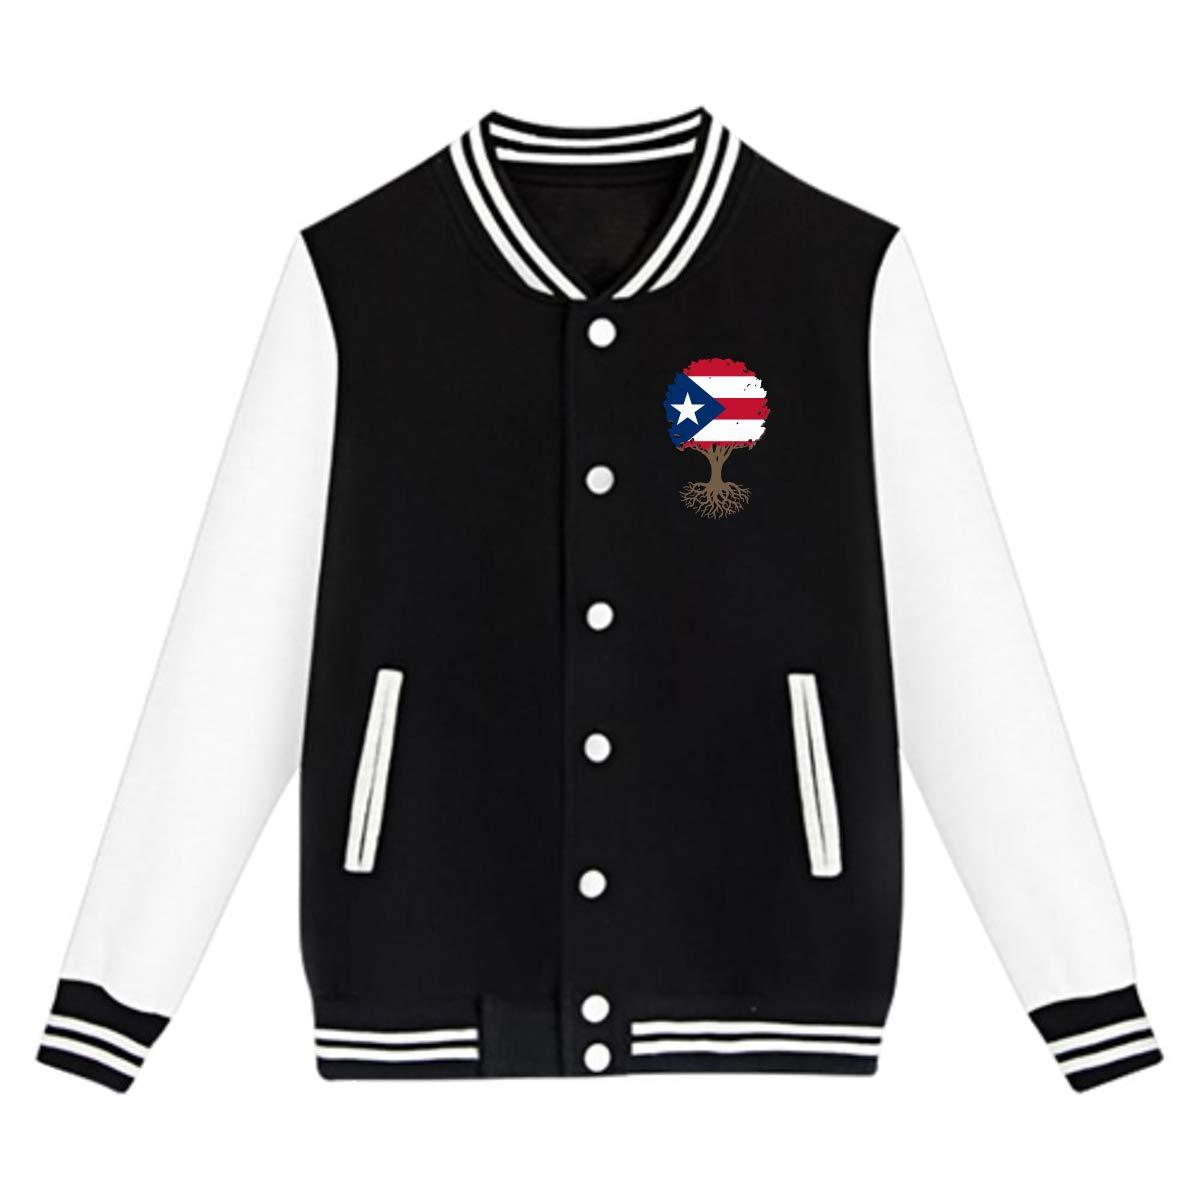 Unisex Teen Baseball Uniform Jacket Tree of Life with Puerto Rico Flag Sweater Sport Coat